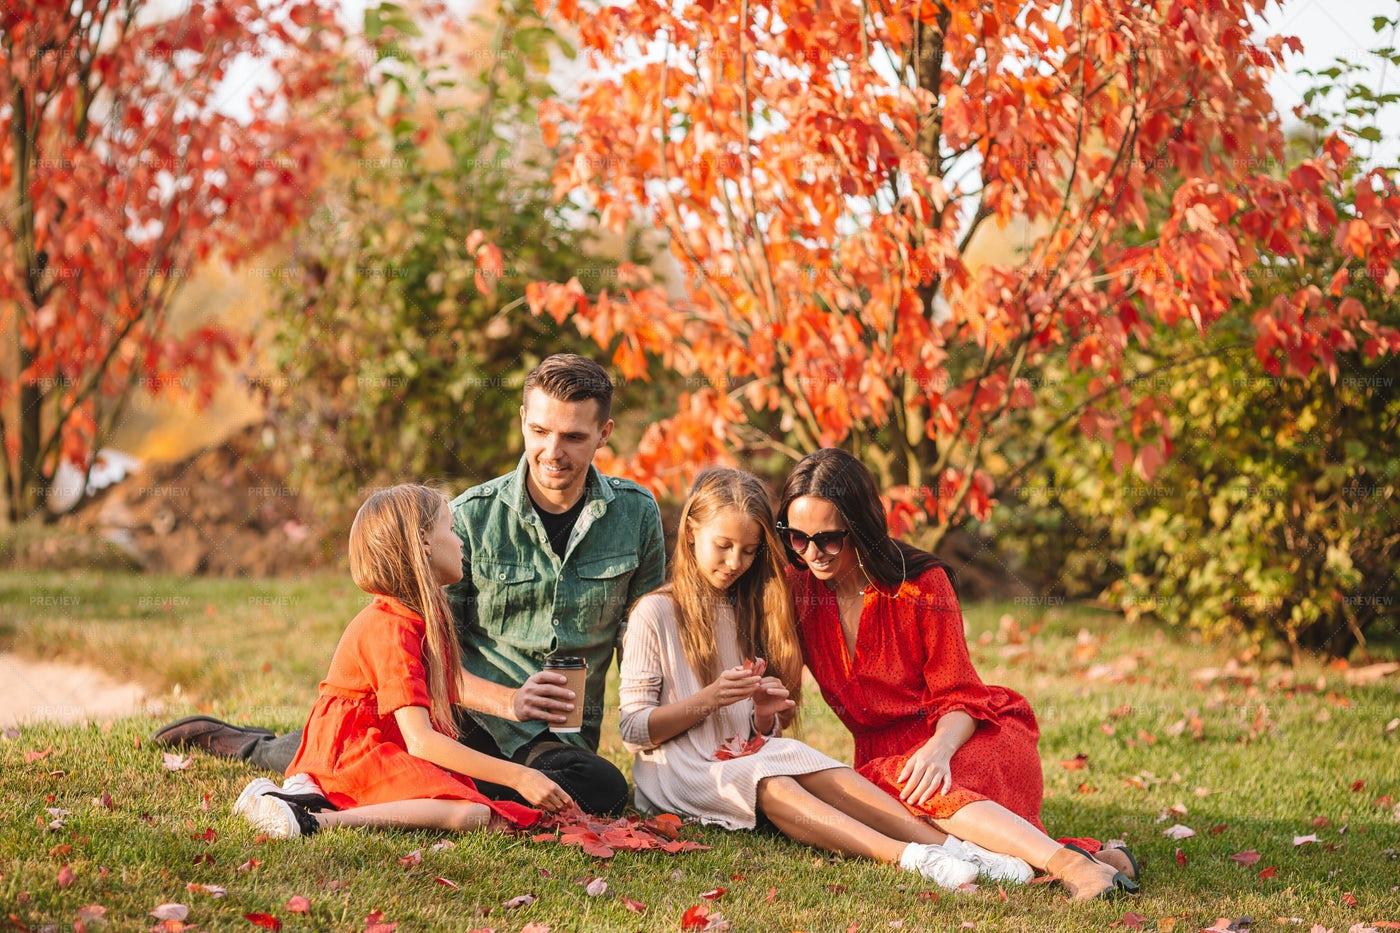 Family Sitting In Autumn Park: Stock Photos